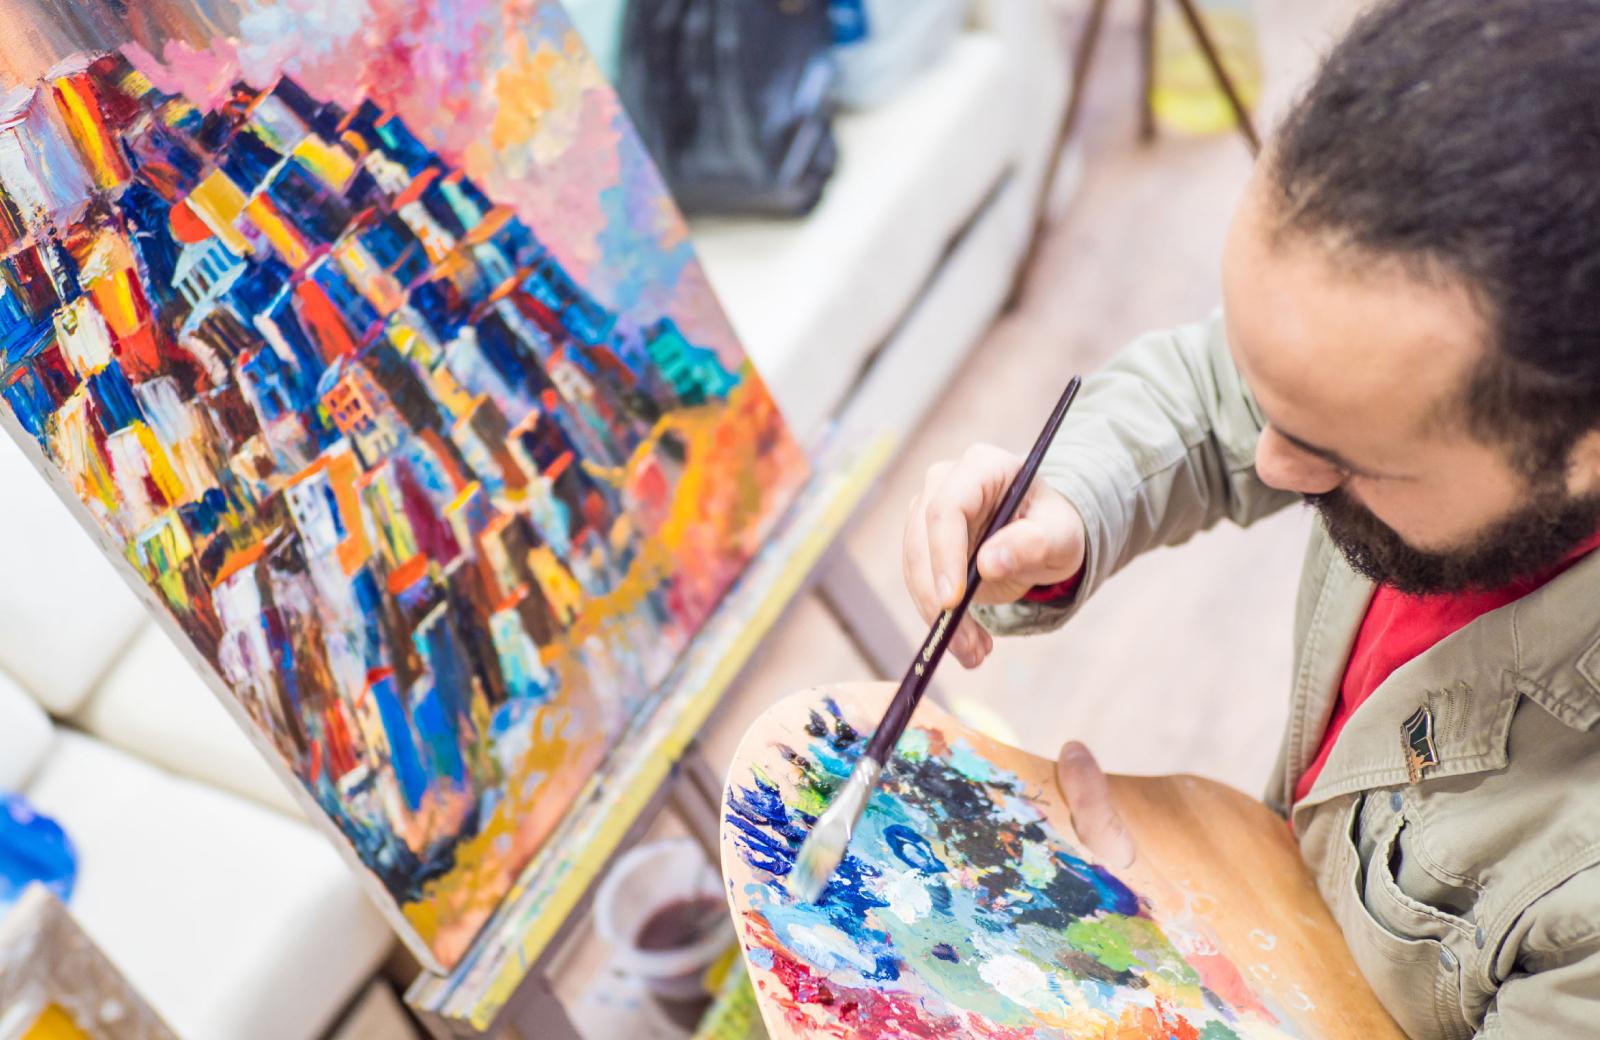 Mountain View Art Festival - The Village Residences Apts